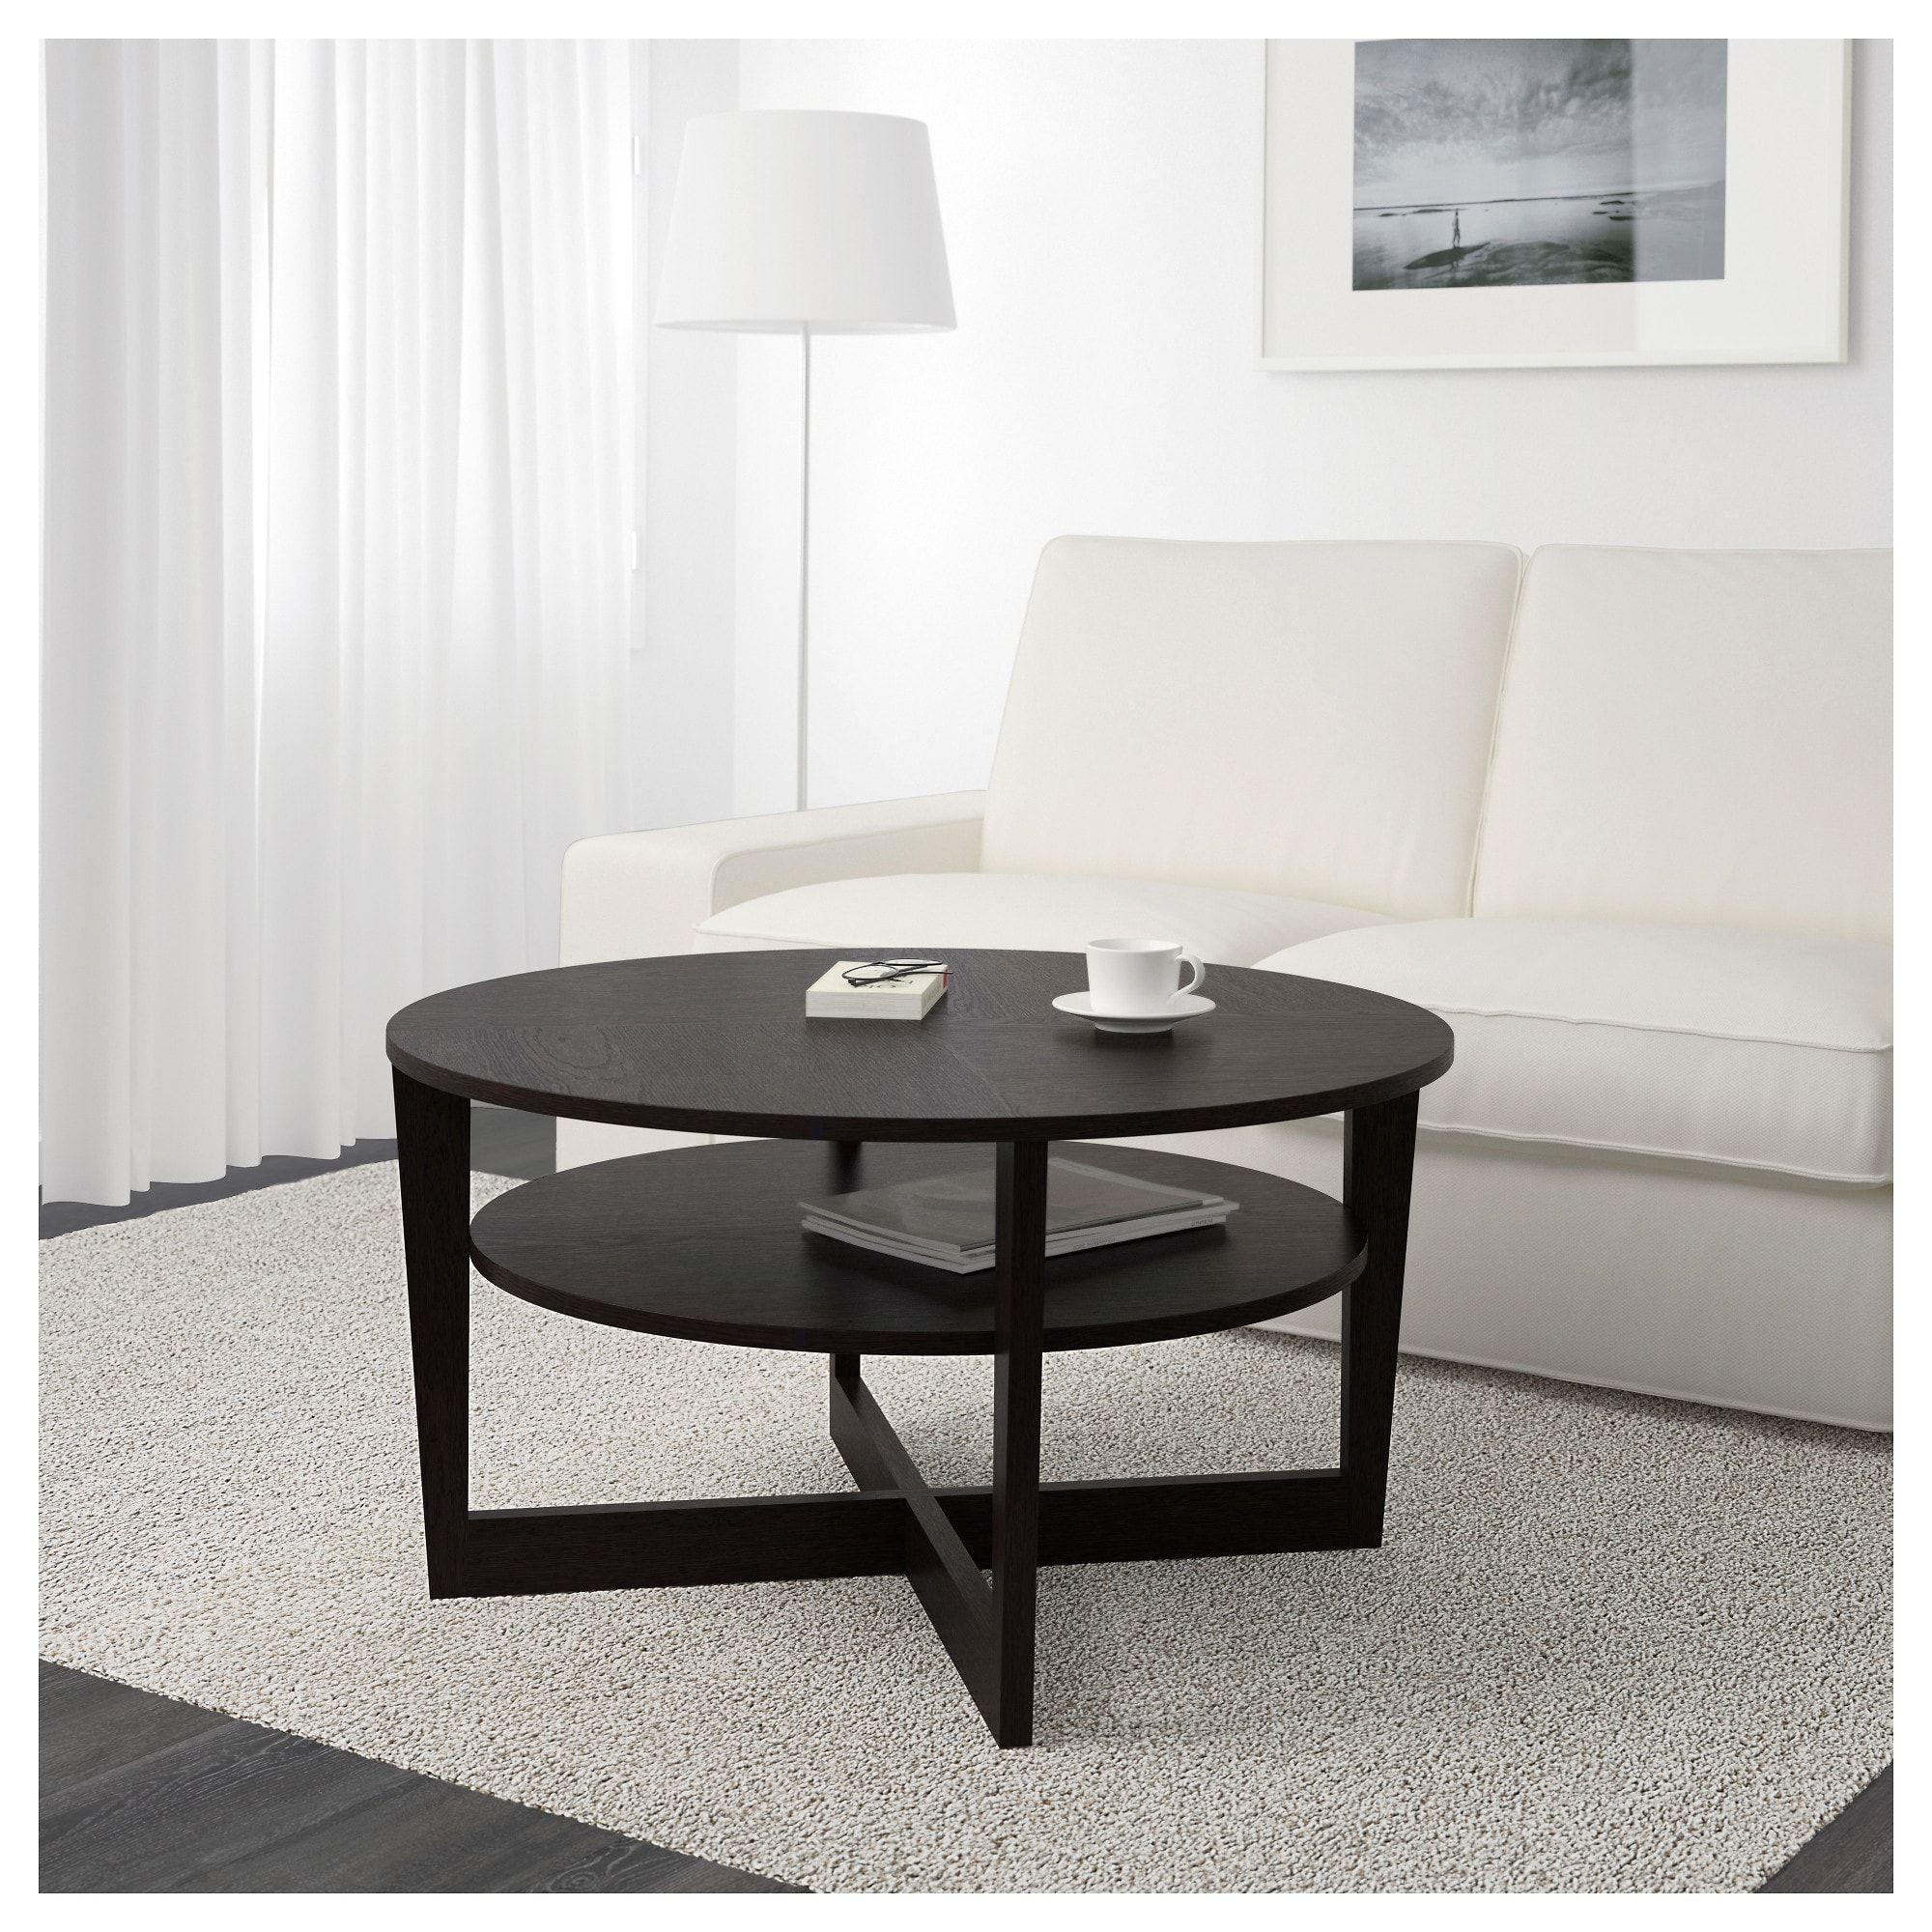 Home Furniture Store Modern Furnishings Decor Ikea Side Table Coffee Table Ikea Lack Side Table [ 2000 x 2000 Pixel ]